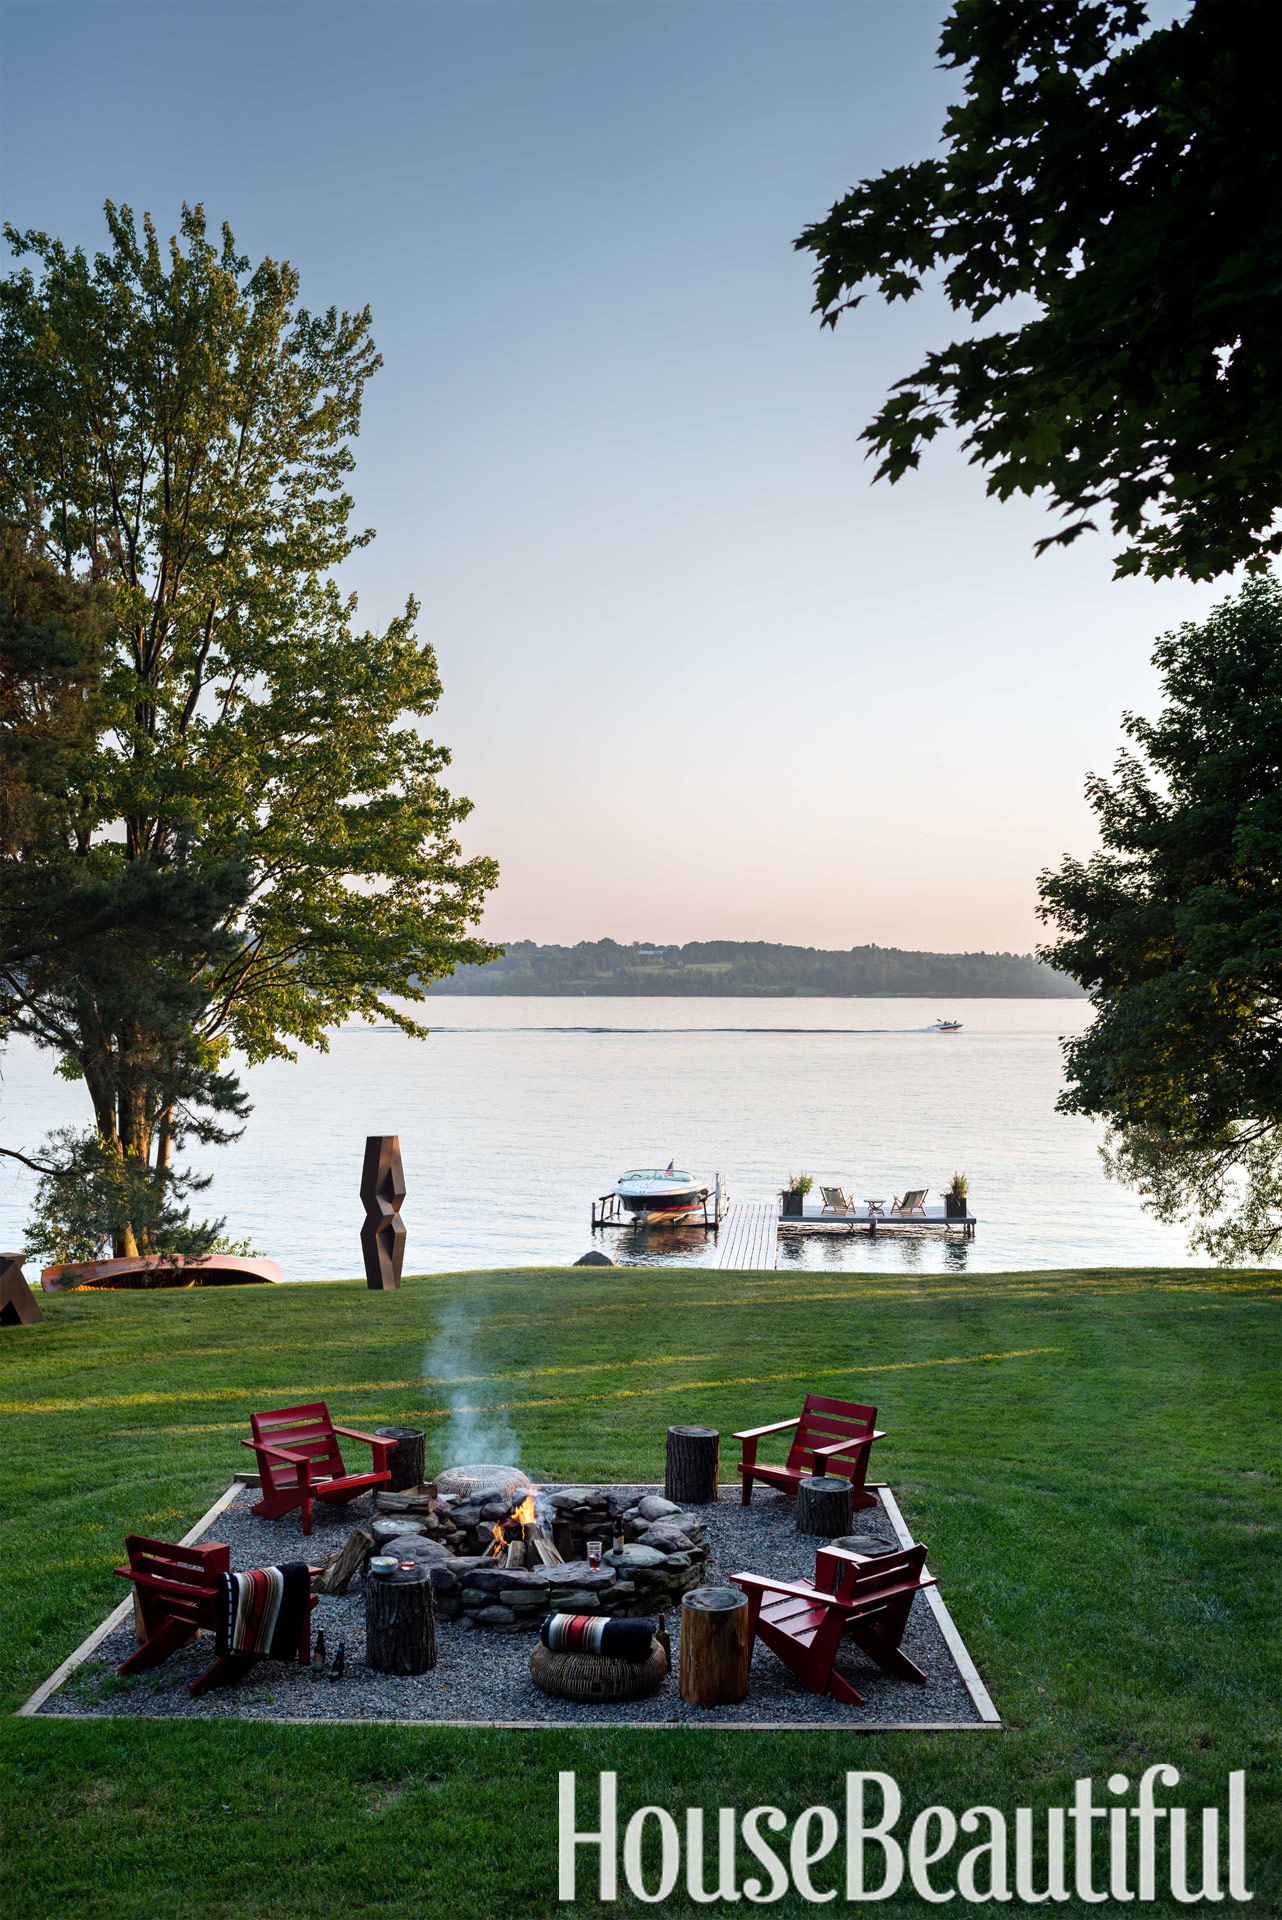 Thom Filicia Lake House thom filicia lake house - house beautiful pinterest favorite pins